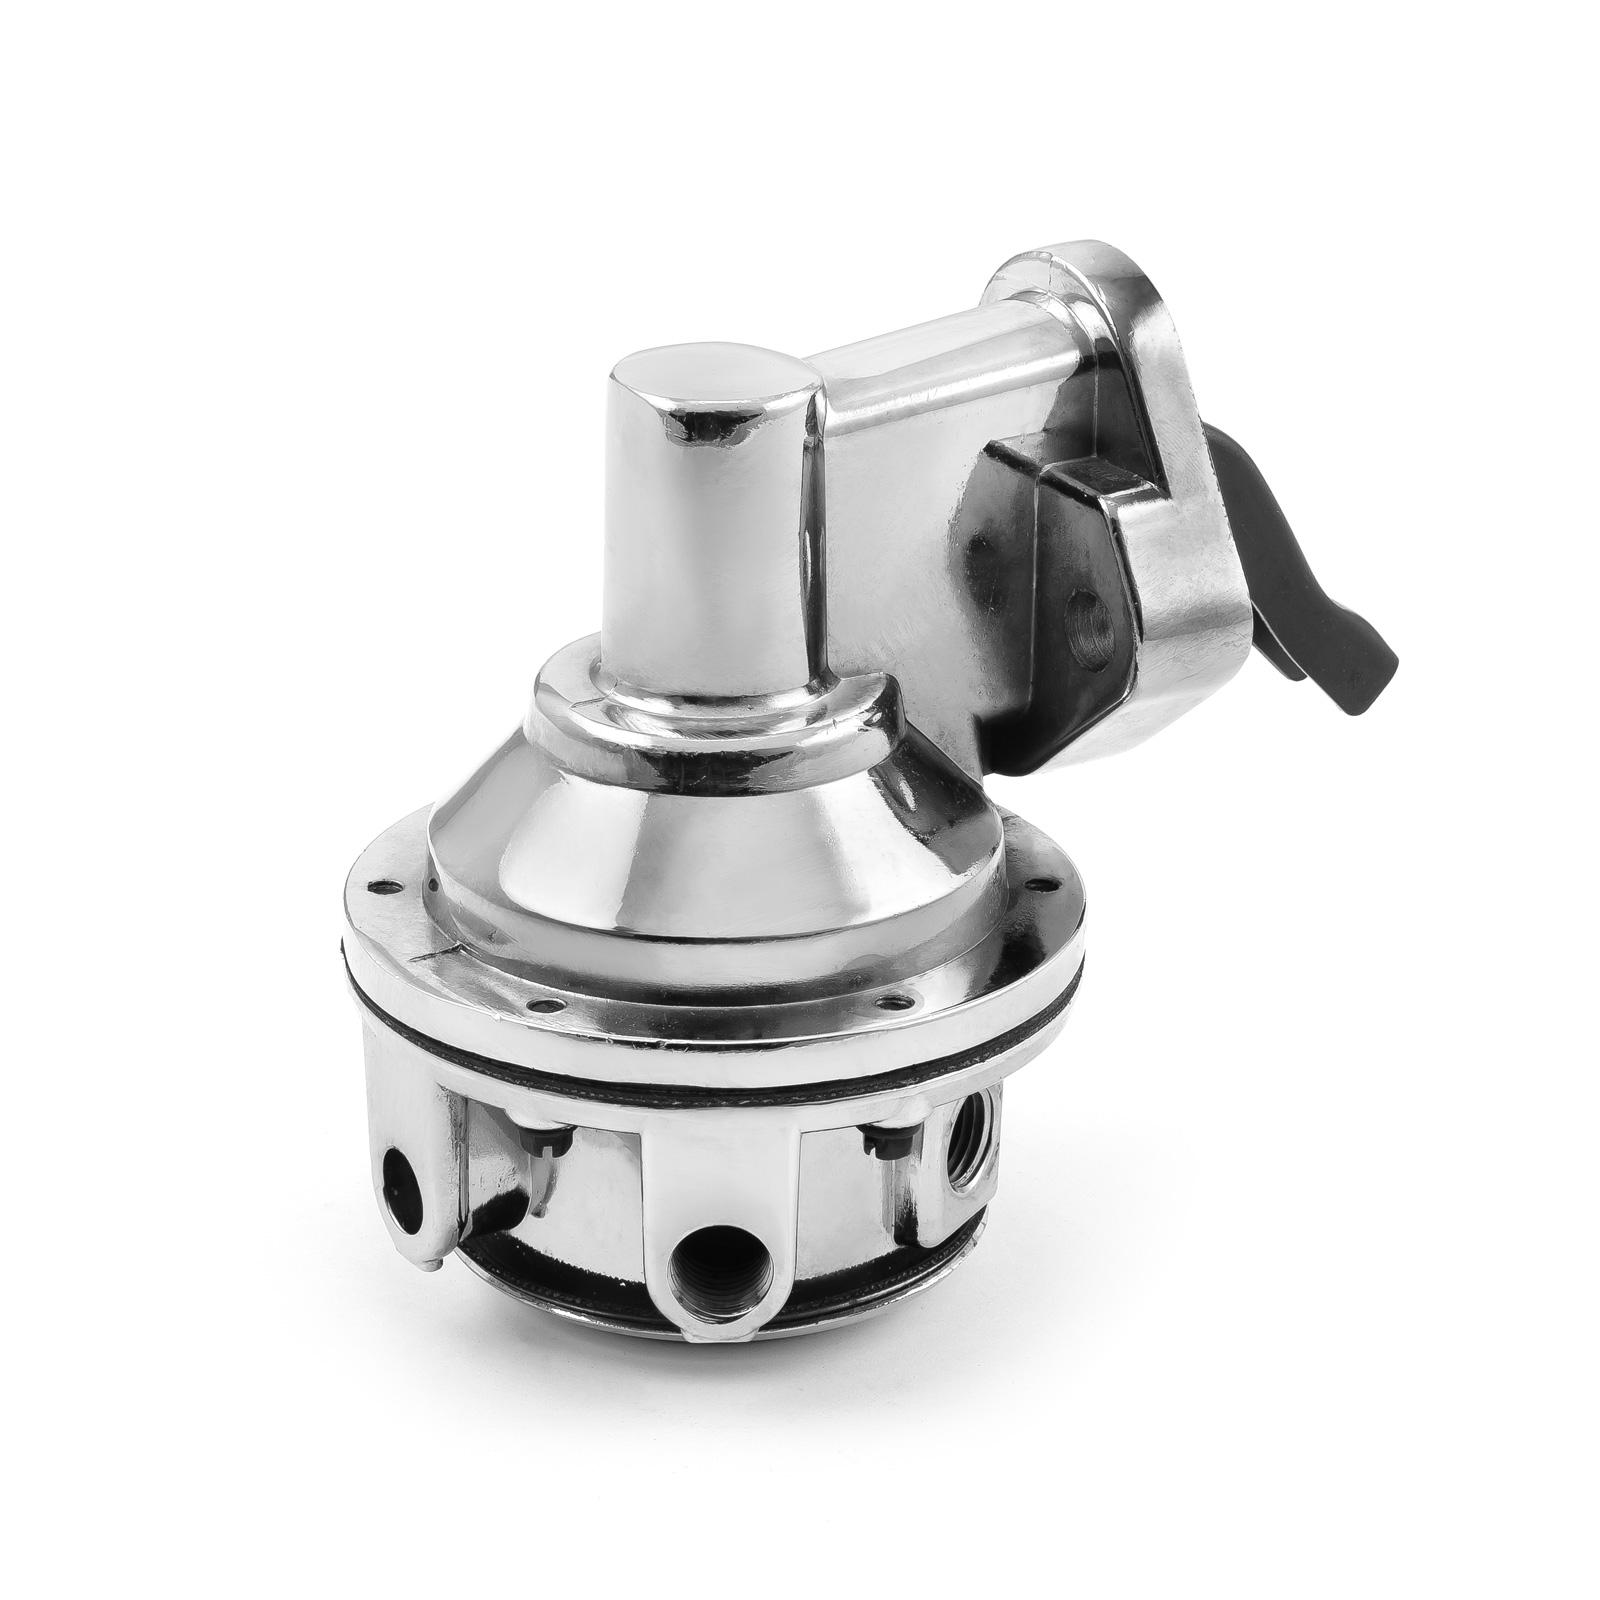 "Chevy BBC 454 High Volume Mechanical Fuel Pump Chrome 1/4"" NPT Fitting"